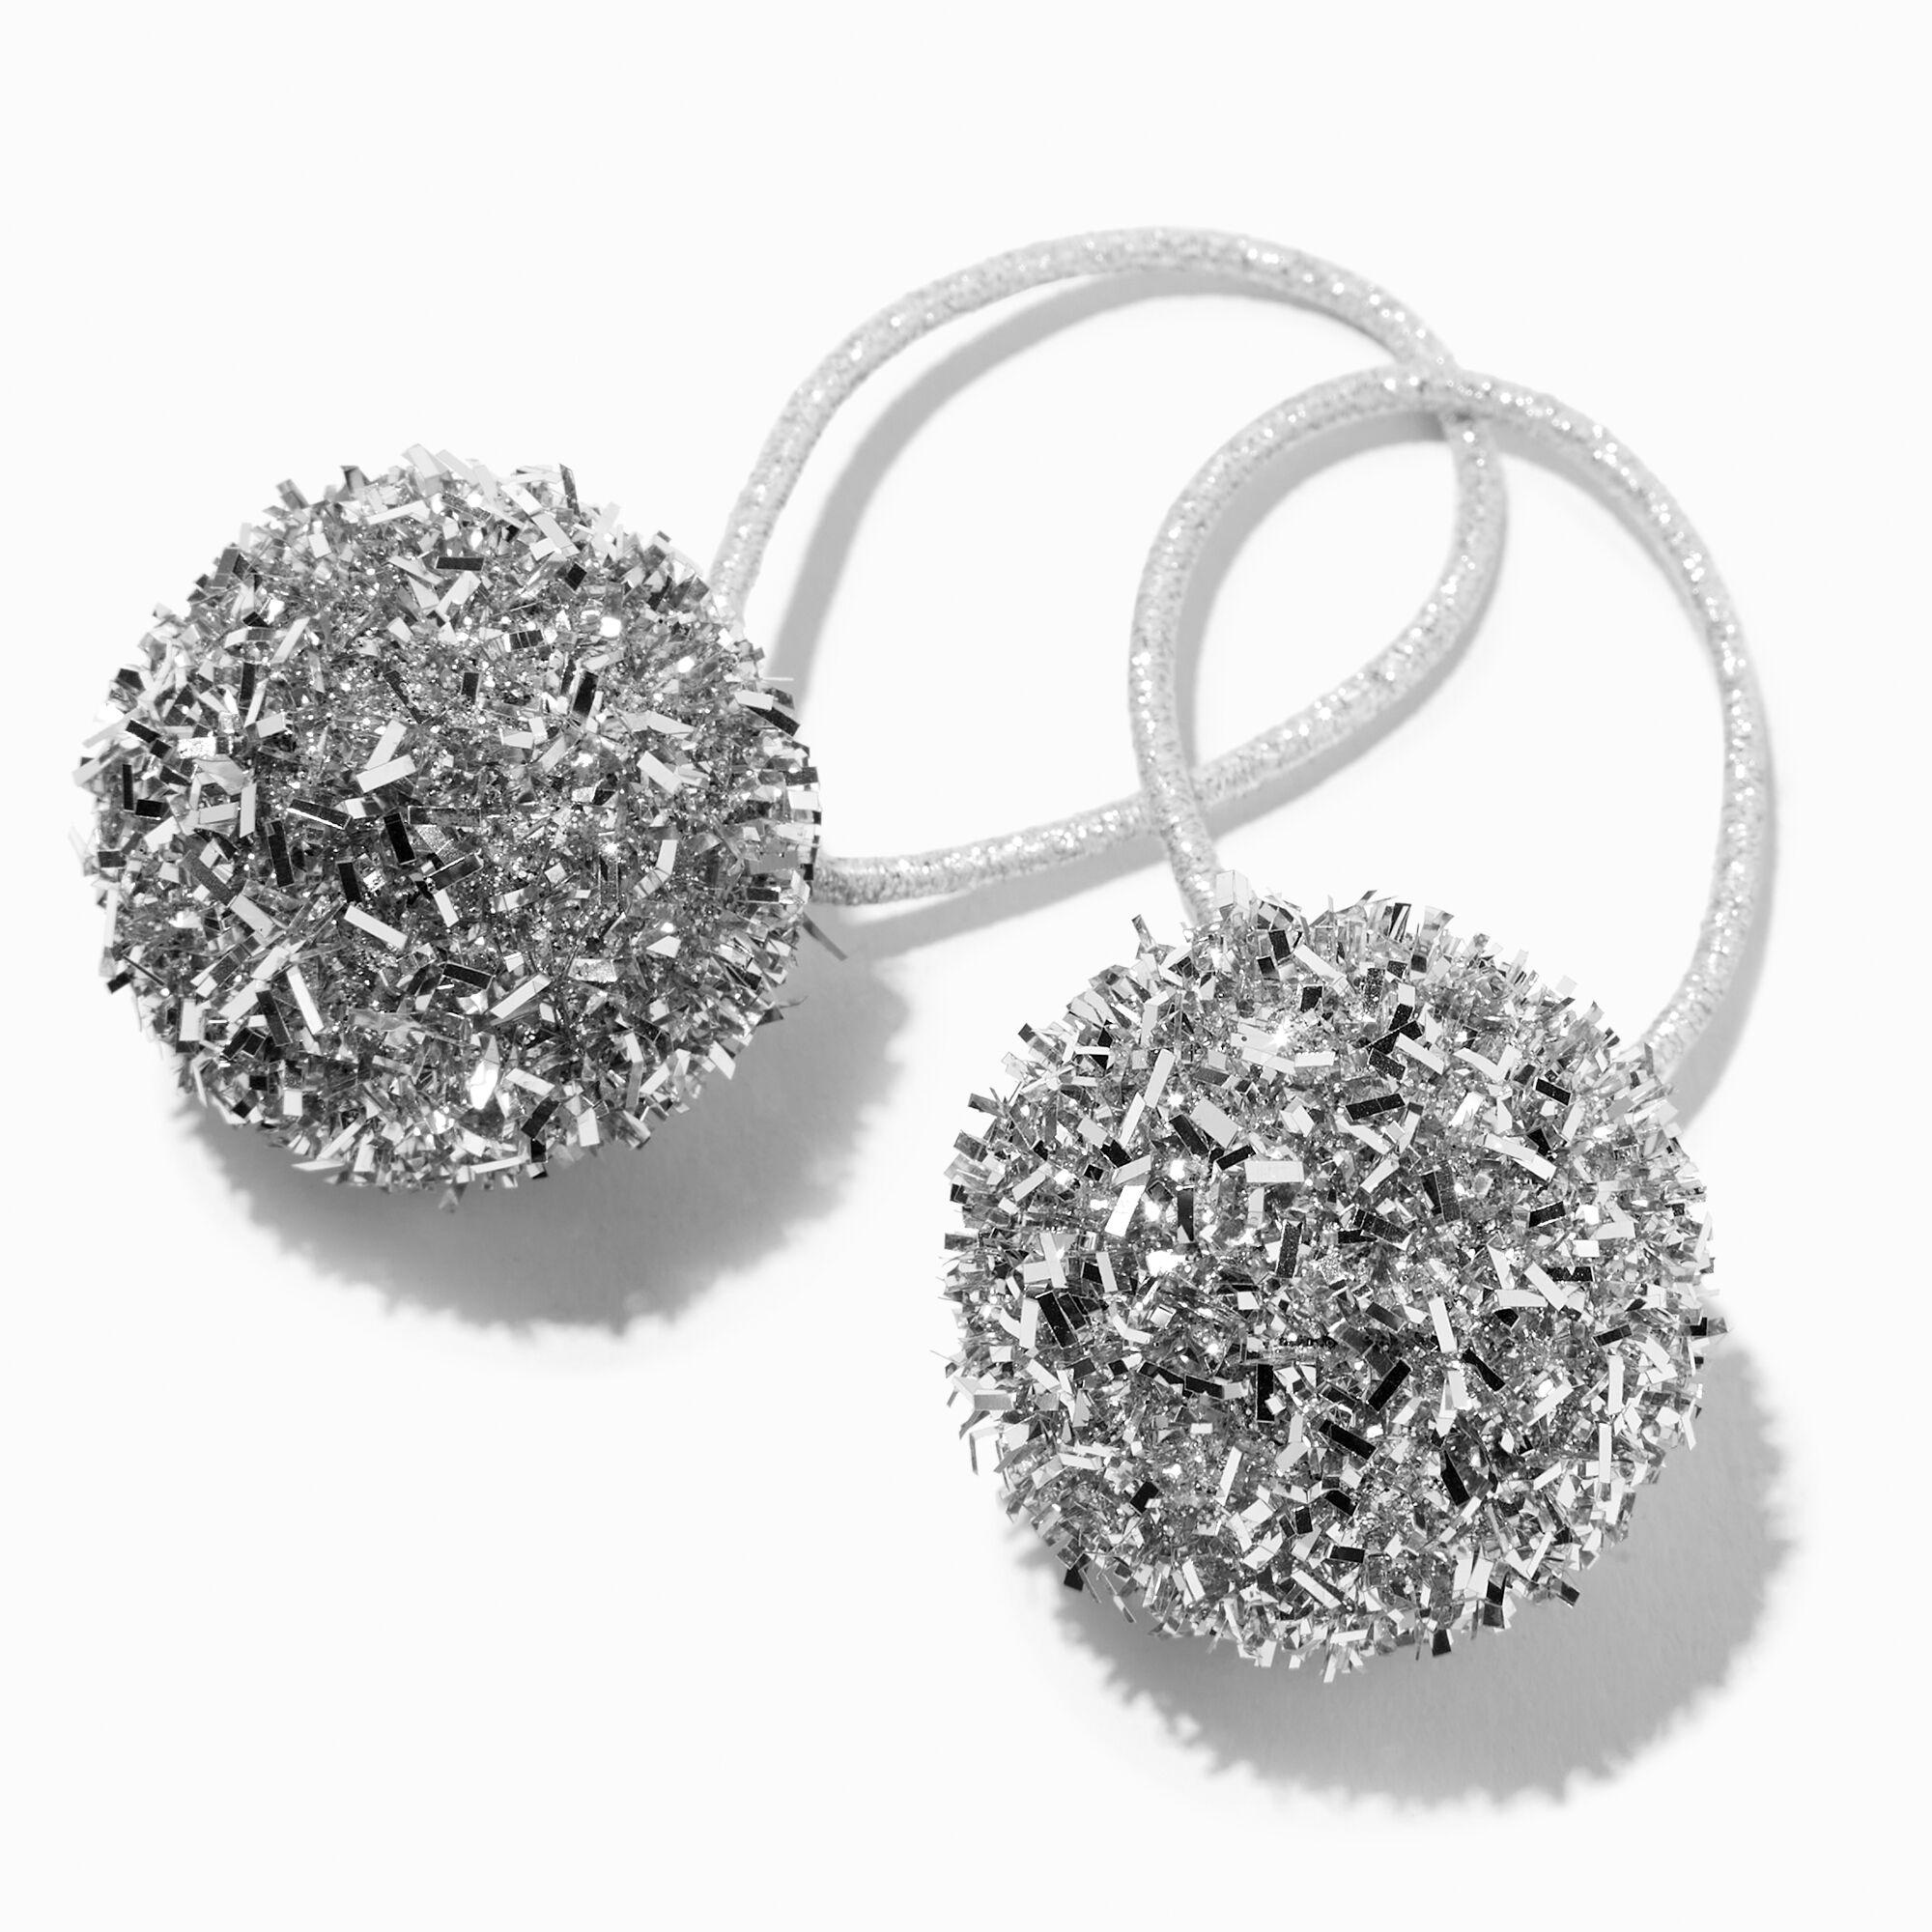 iphone 7 squishy phone case